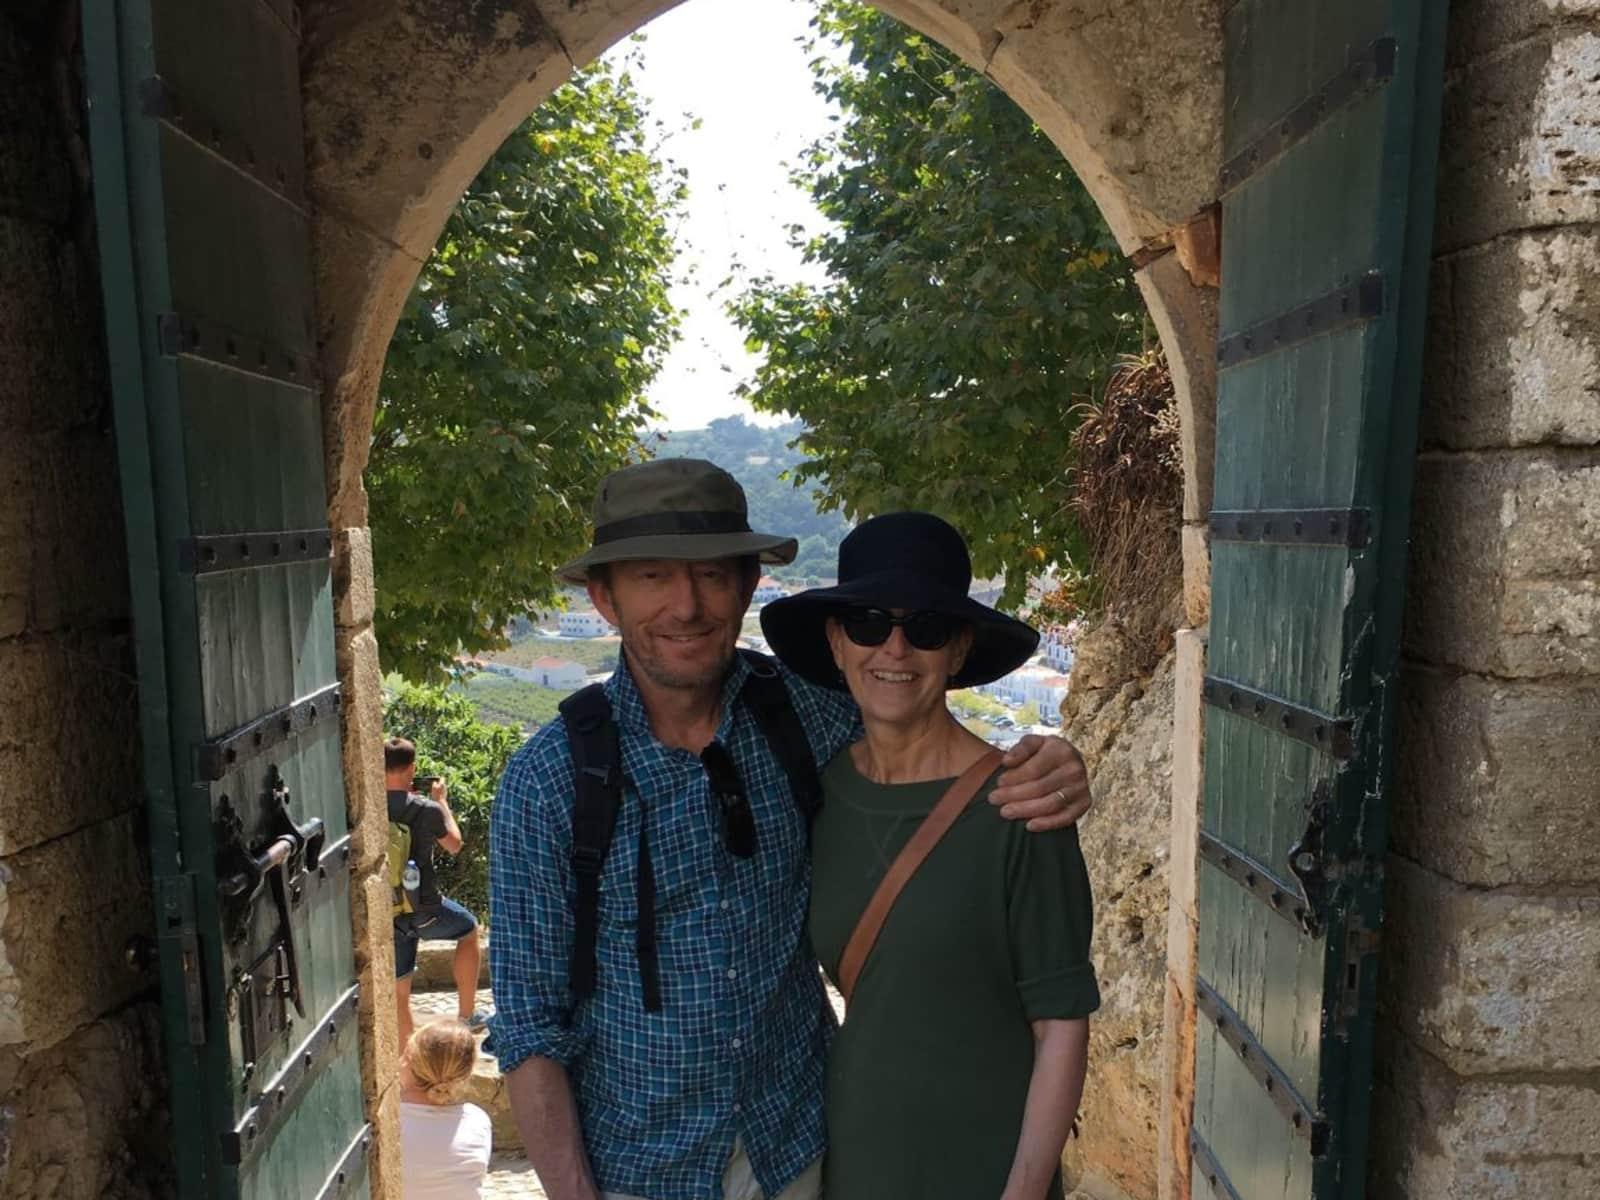 Helen & Michael from South Fremantle, Western Australia, Australia